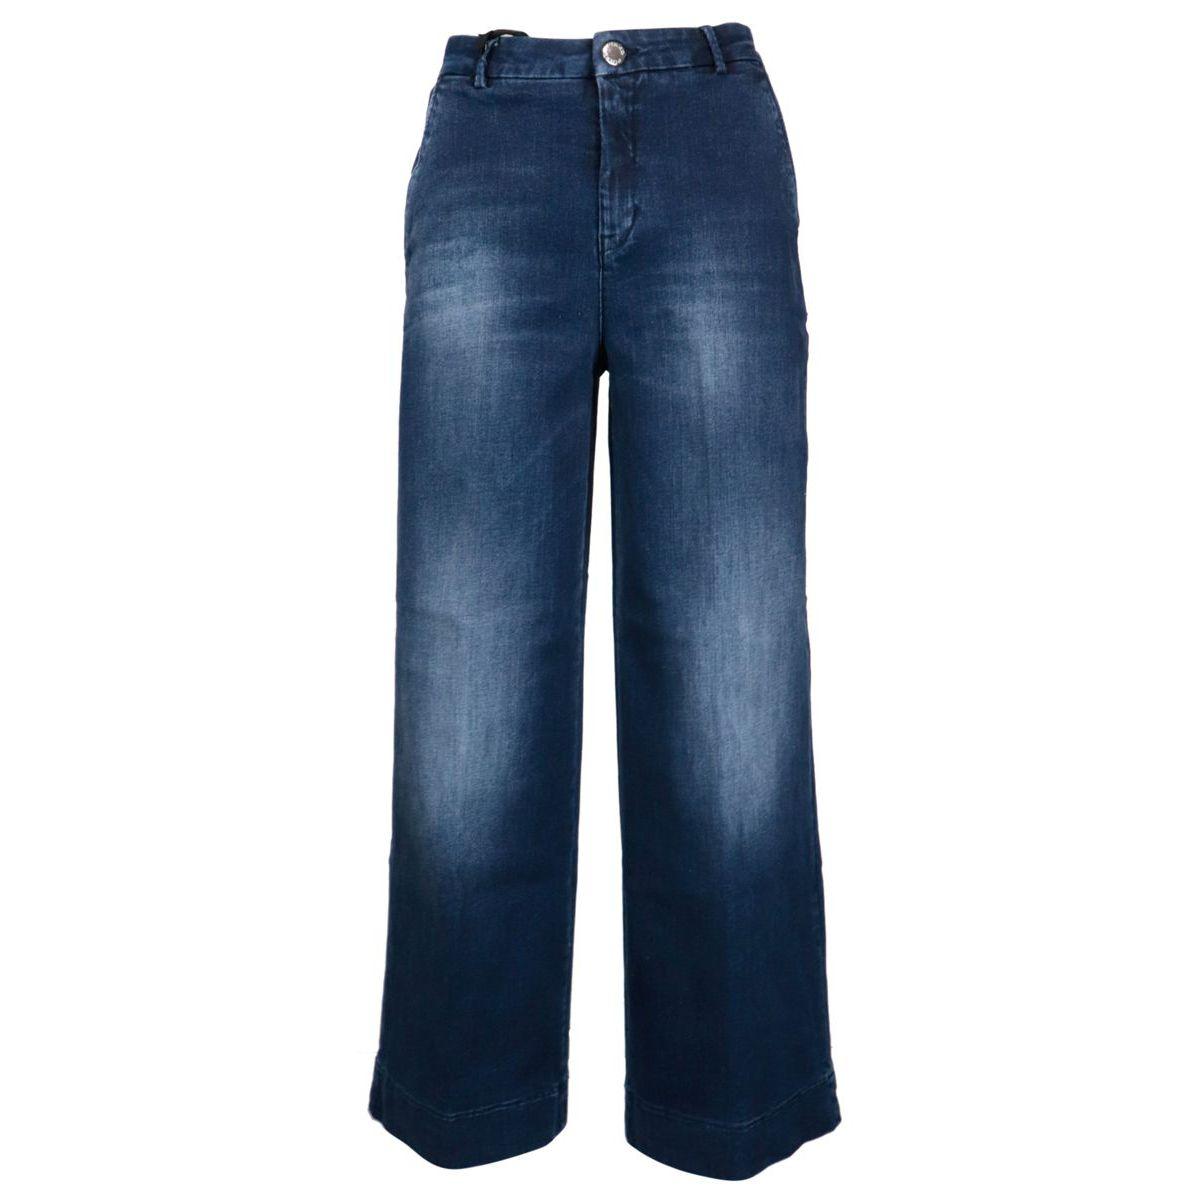 Palazzo jeans in dark denim Blue denim Pinko